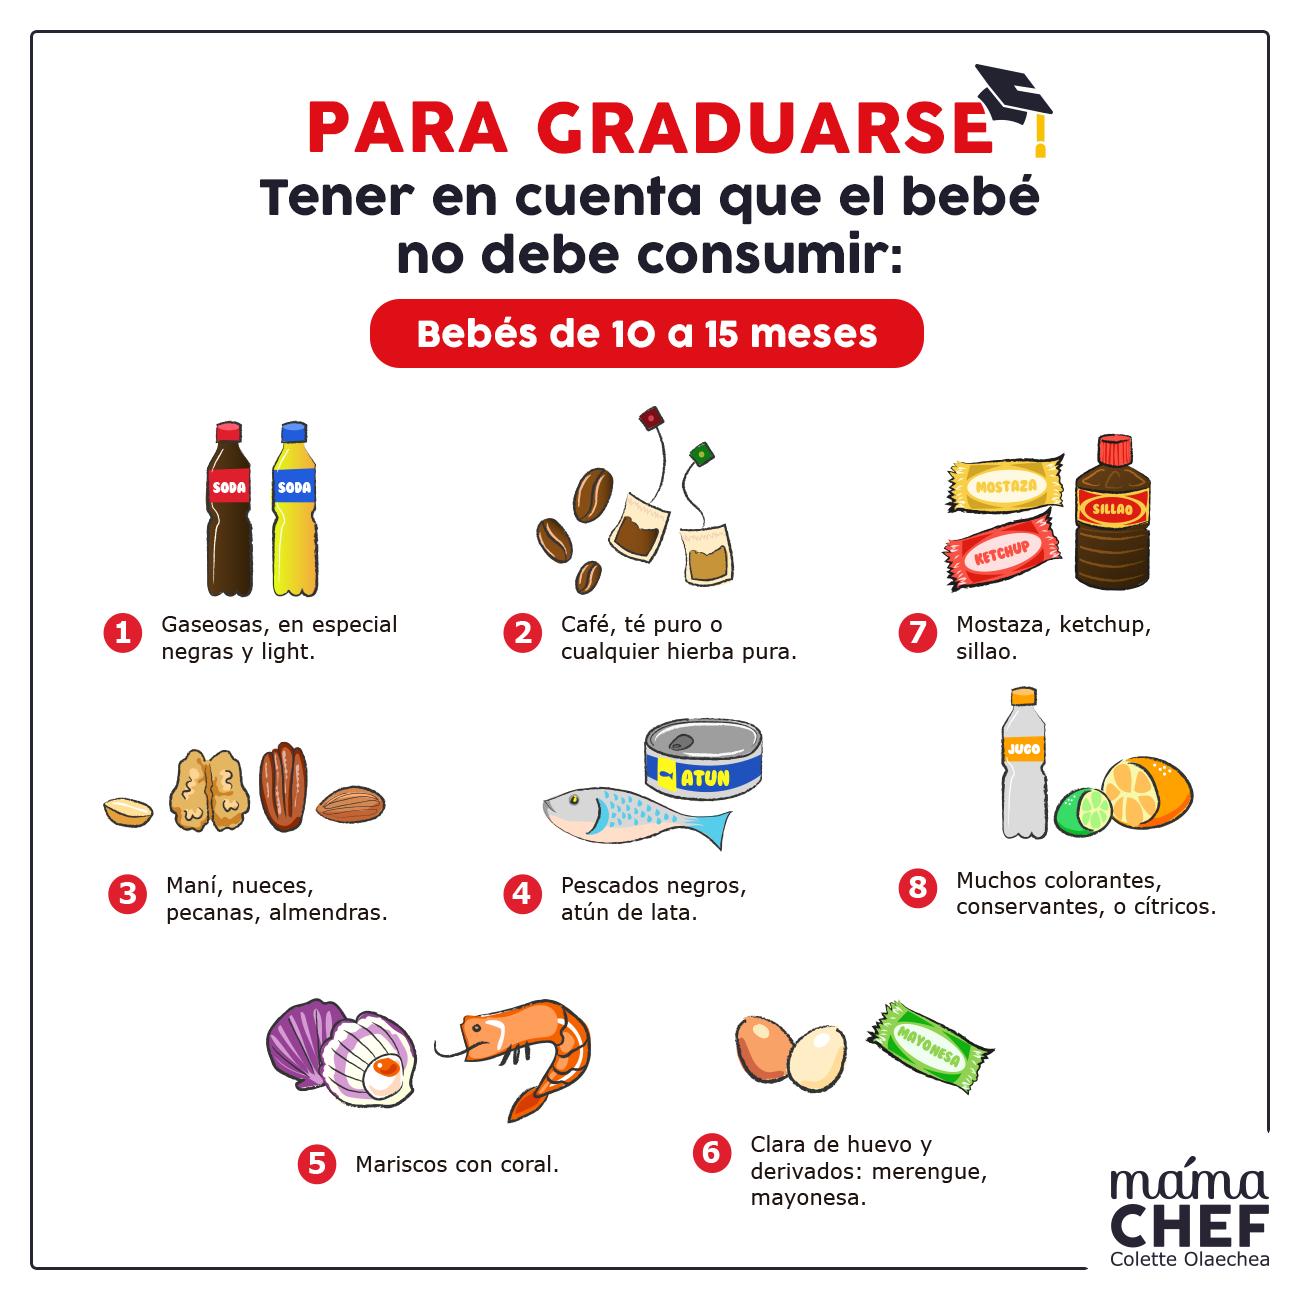 Recomendaciones Para Bebes De 19 A 15 Meses Mama Chef Colette Olaechea Alimentacion Bebe Comida Para Bebes Recetas De Comida Para Bebes